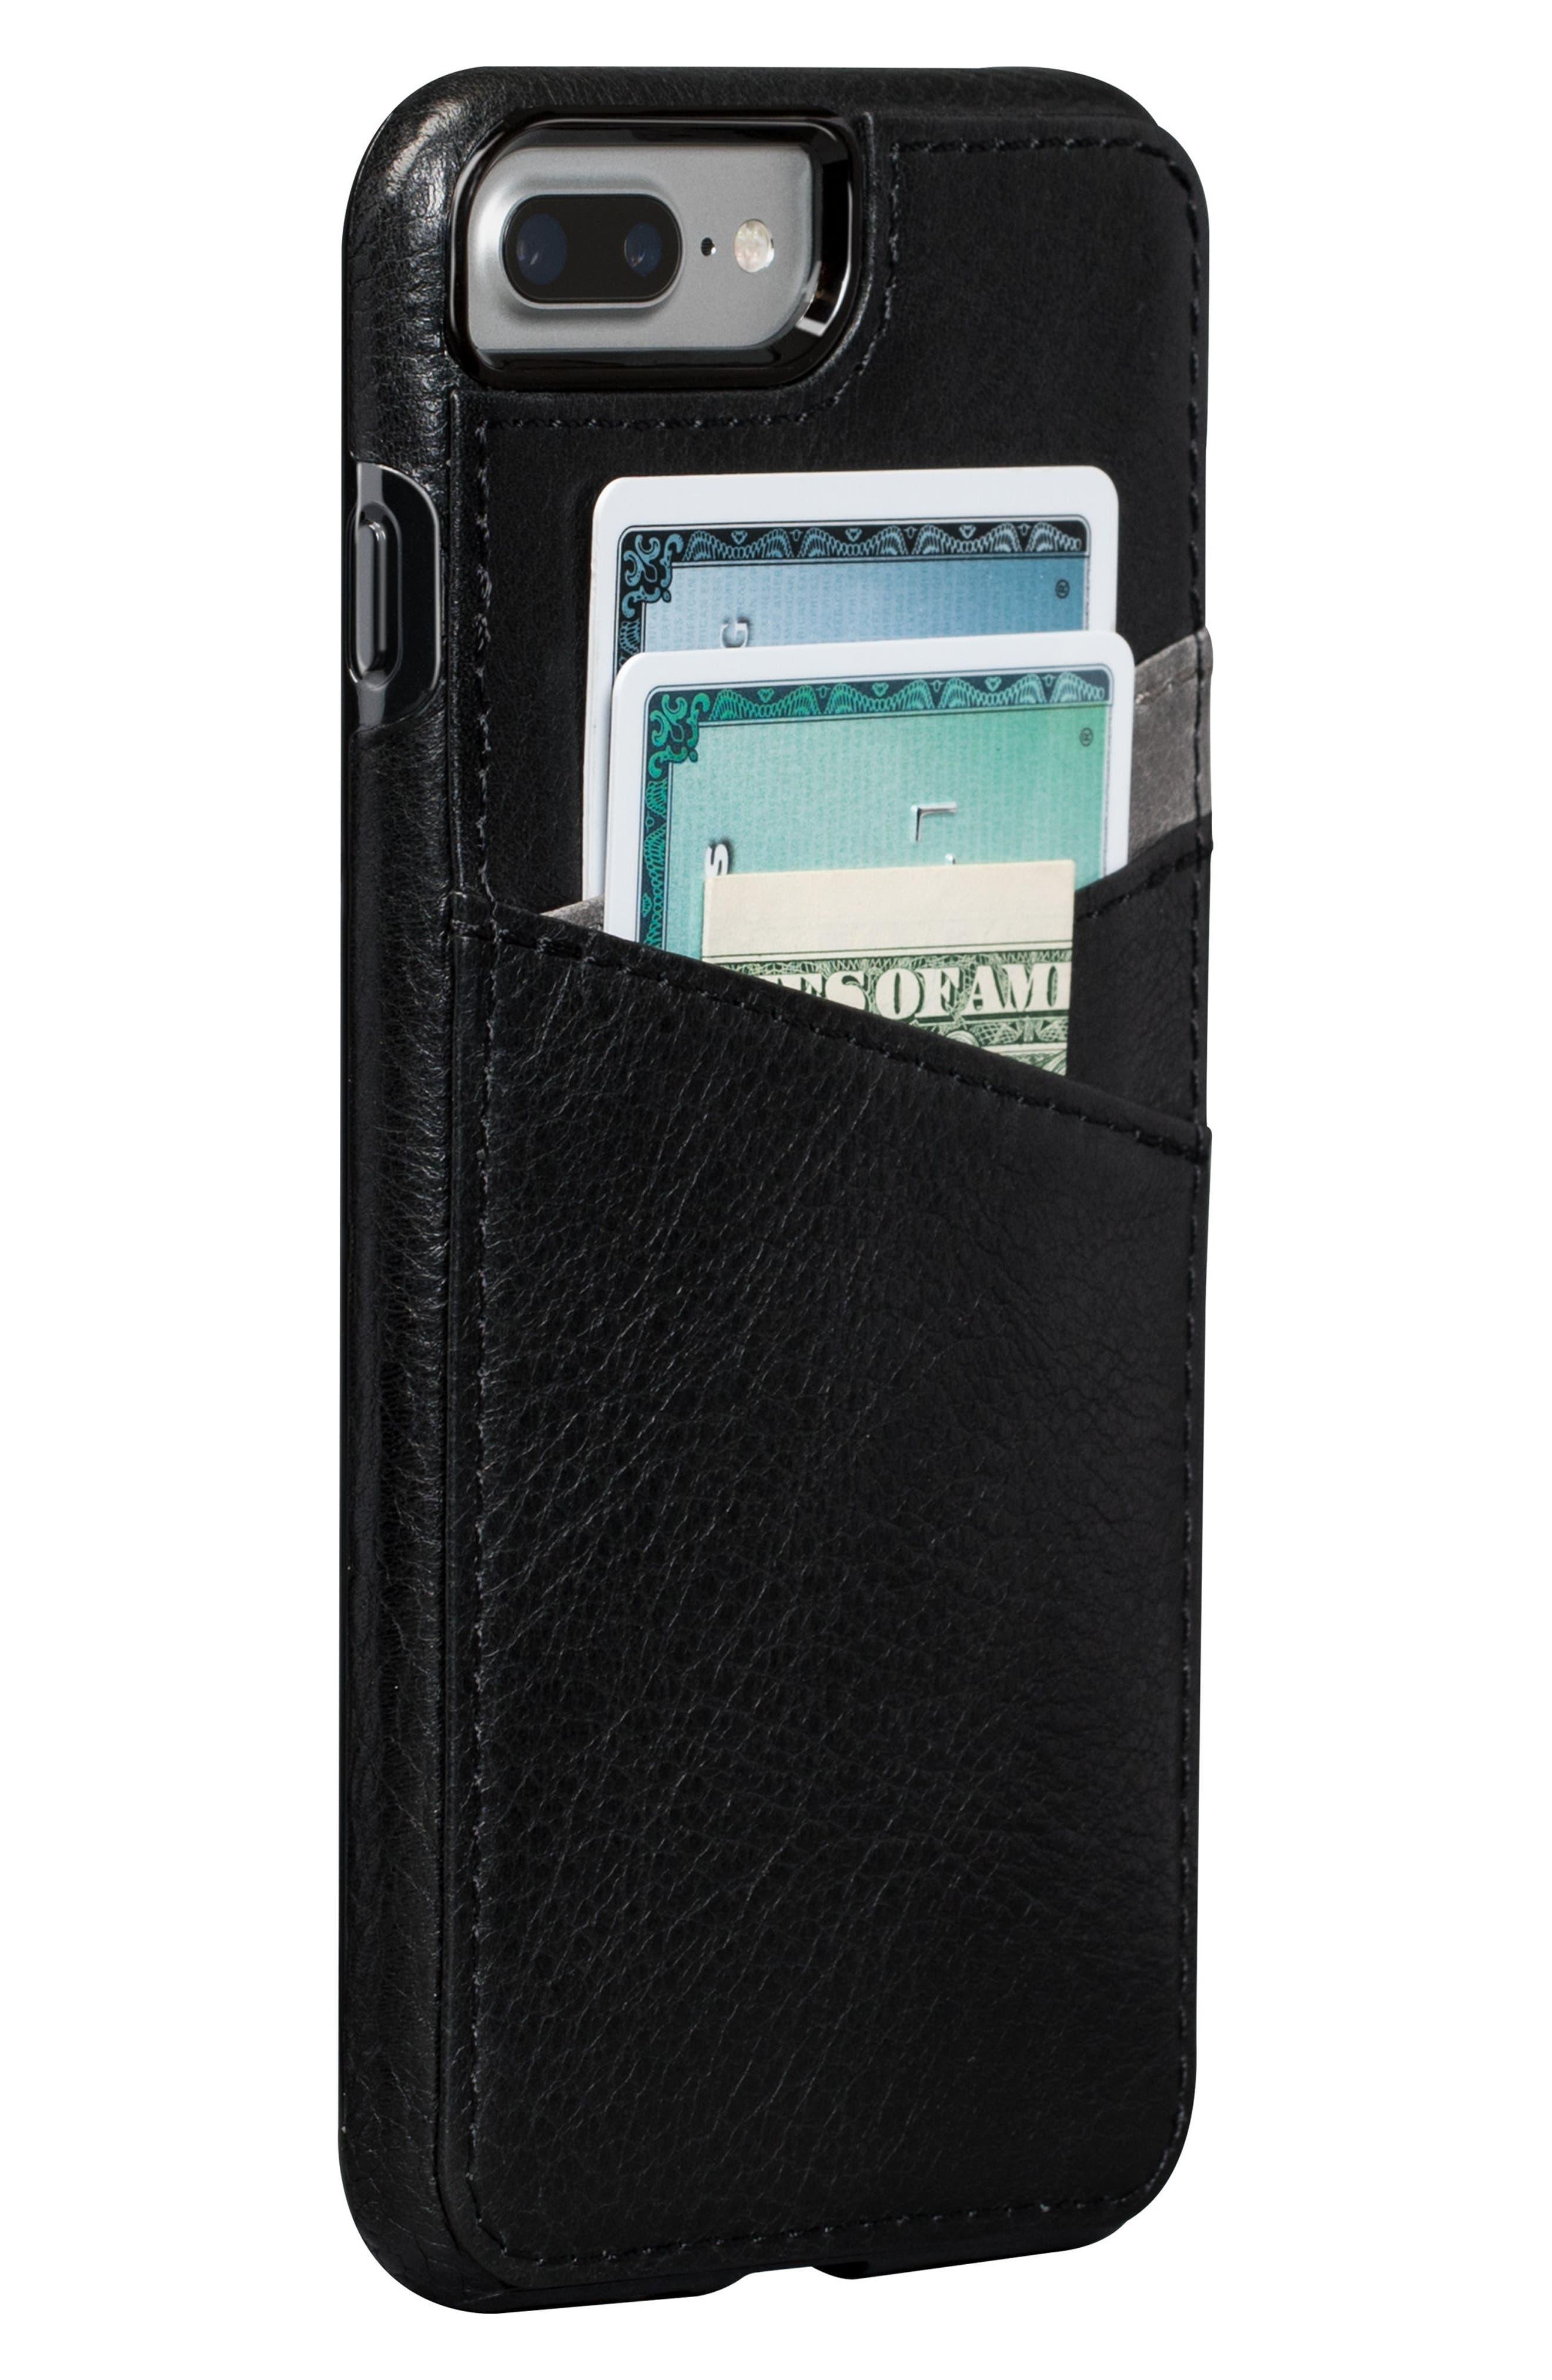 SENA Bence Lugano iPhone 7/8 Plus Wallet Case, Main, color, 001